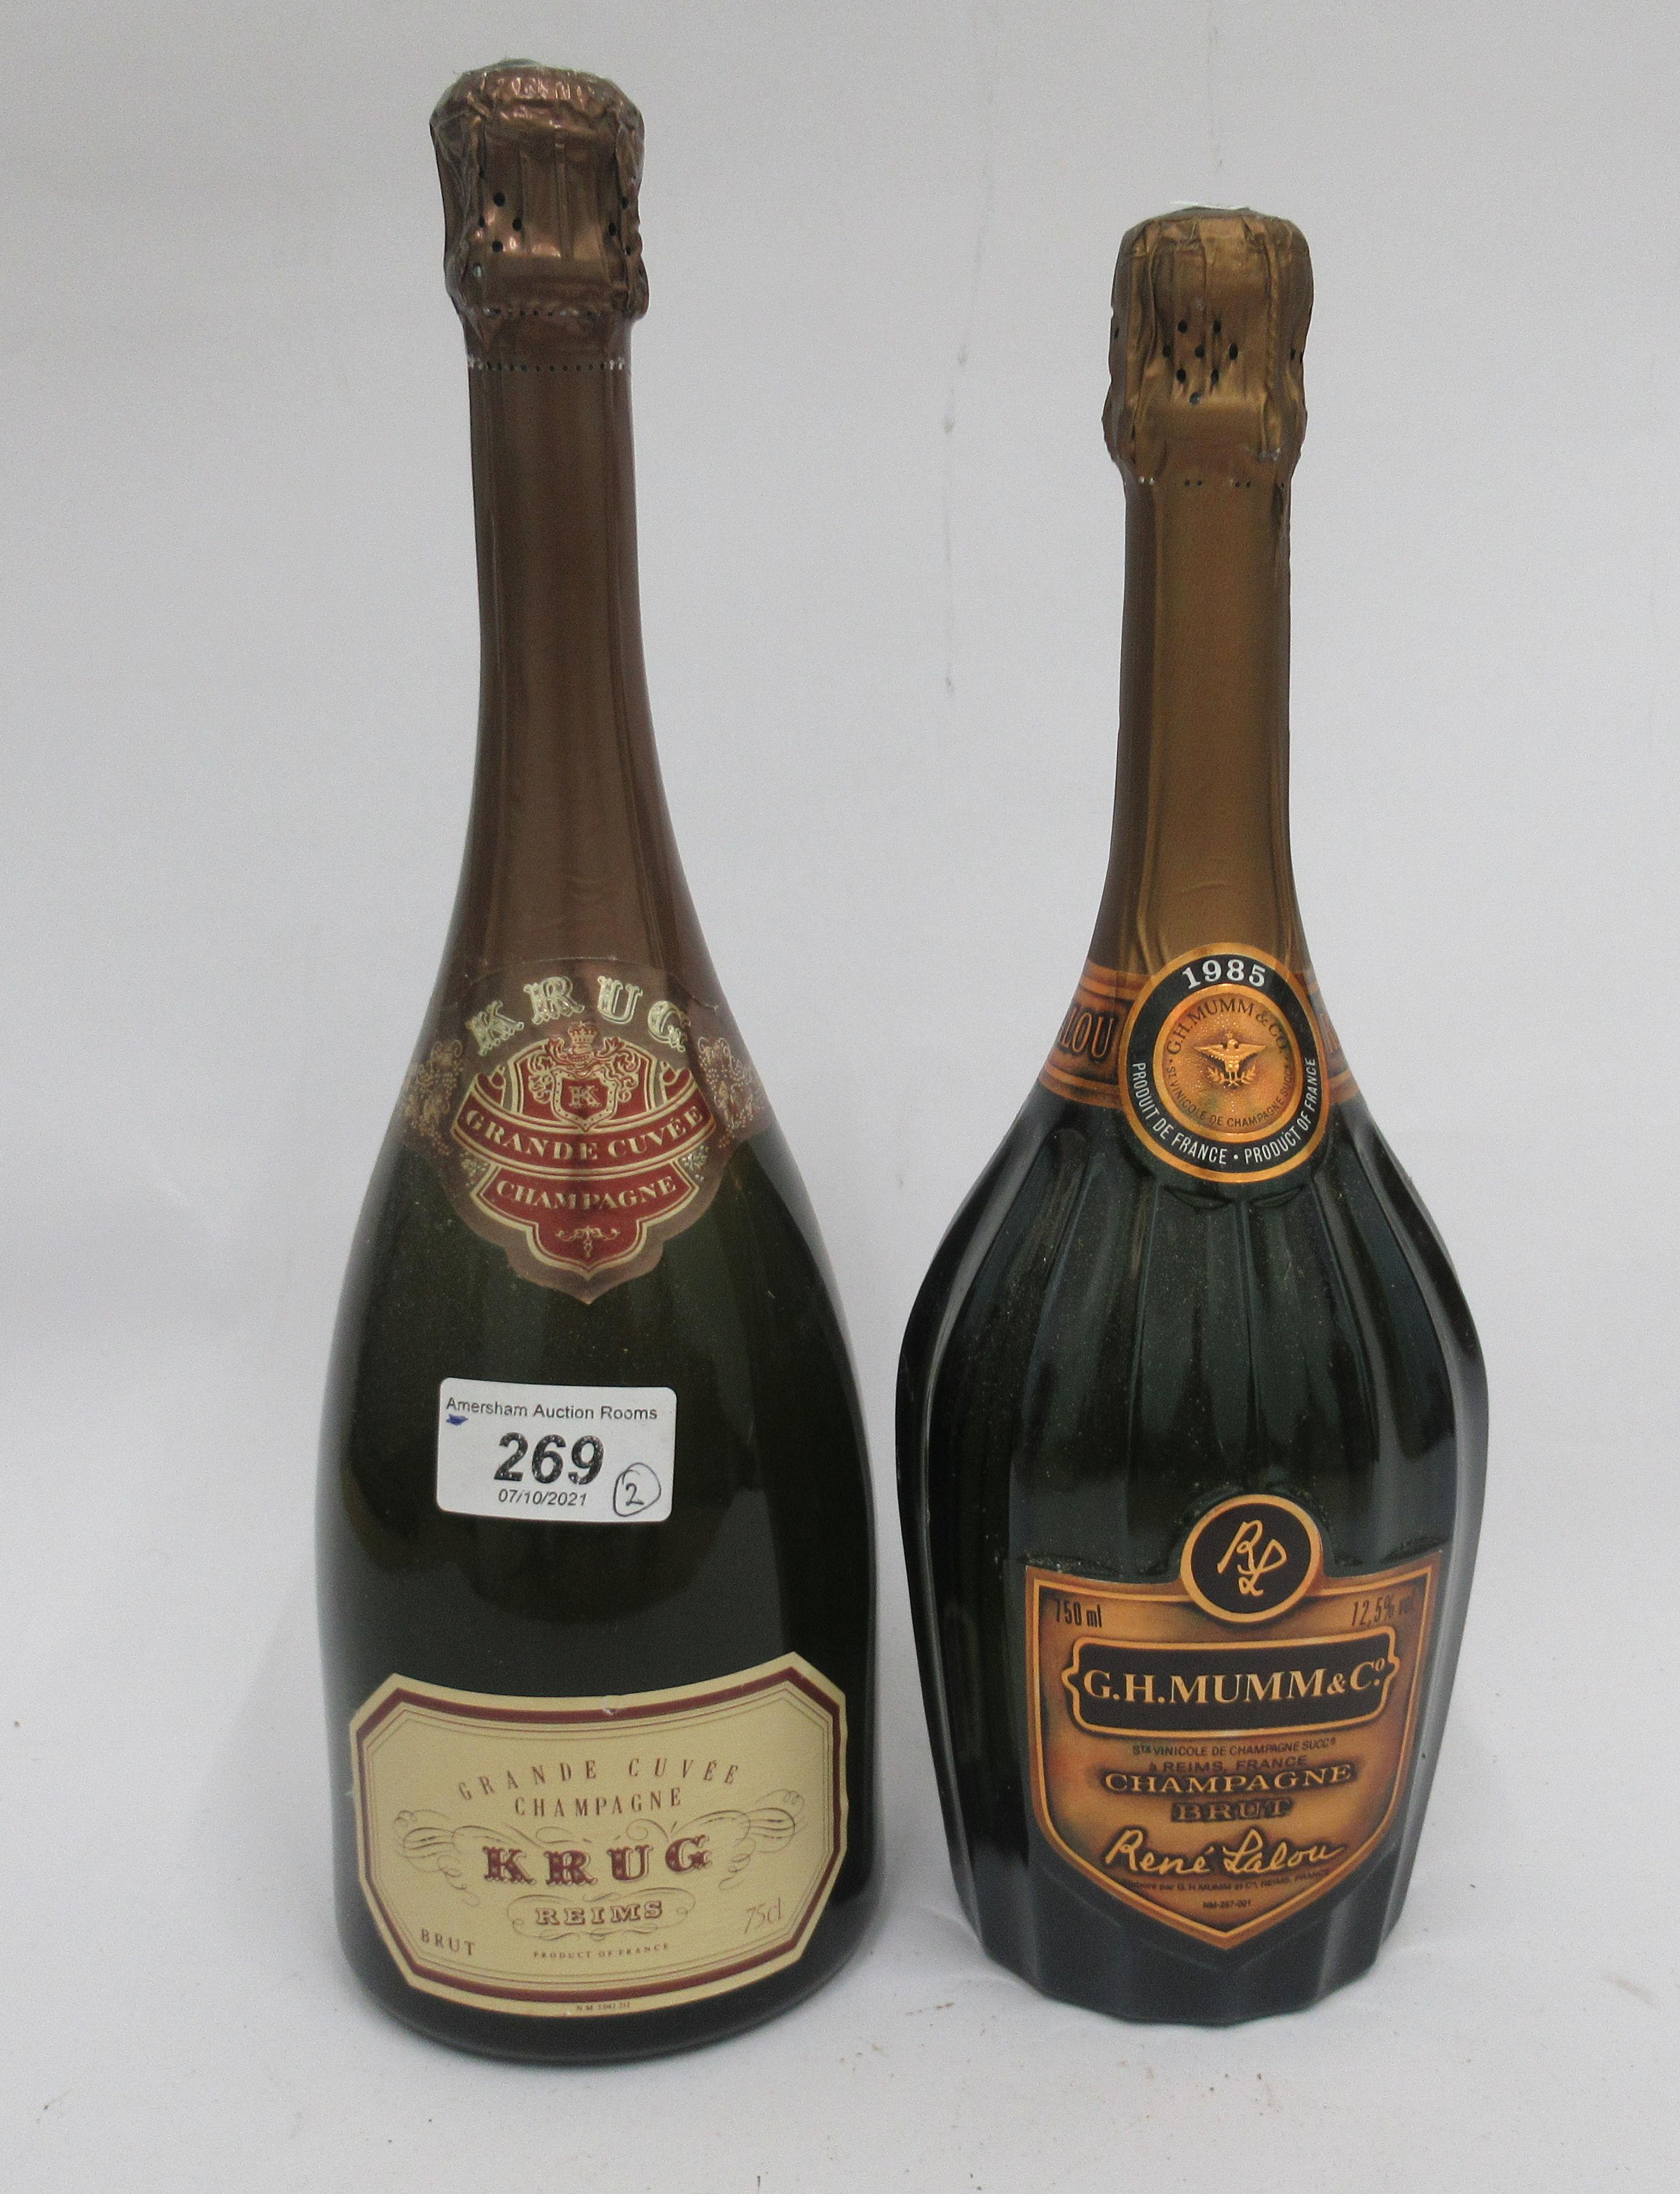 Wine, a bottle of 1985 G H Mumm & Co Brut Champagne; and a bottle of Krug Grande Champagne